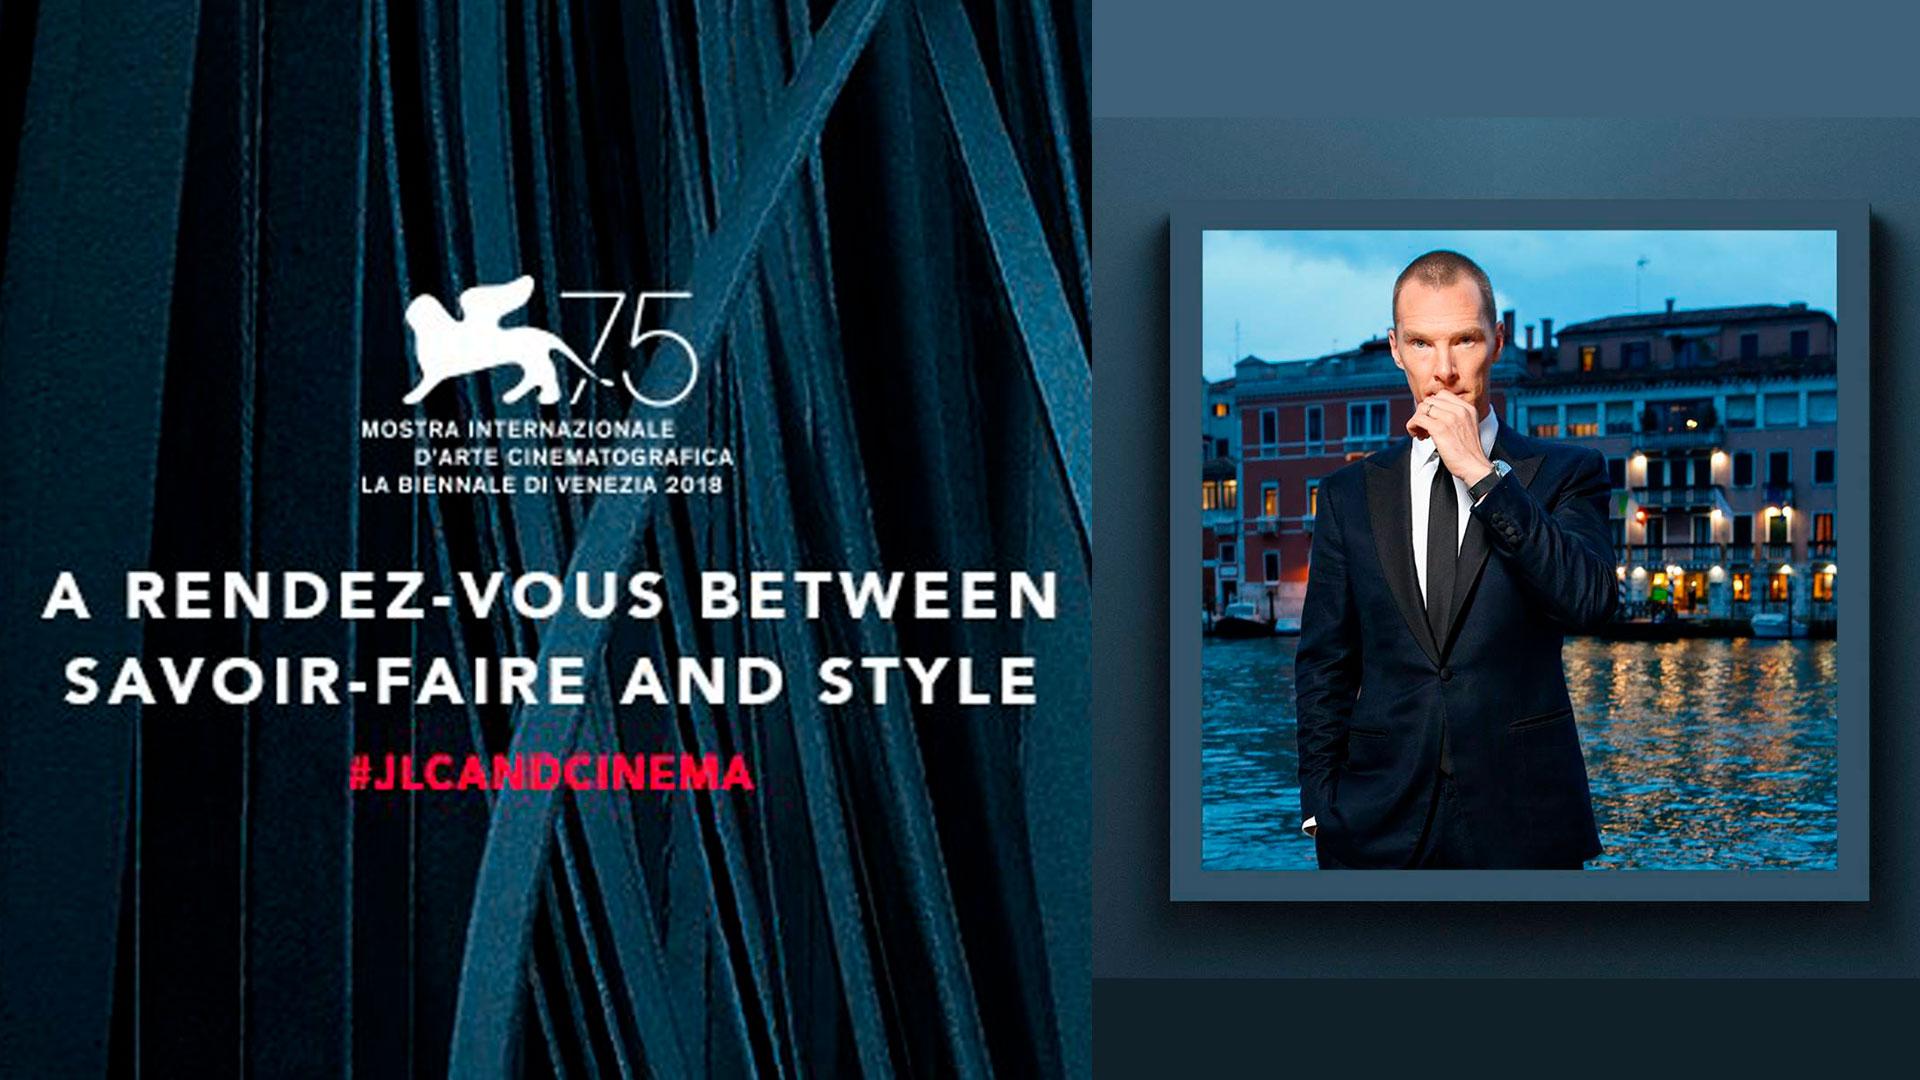 Jaeger-LeCoultre Celebra El Talento Del 7º Arte En La Cena De Gala Del 75° Festival De Venecia